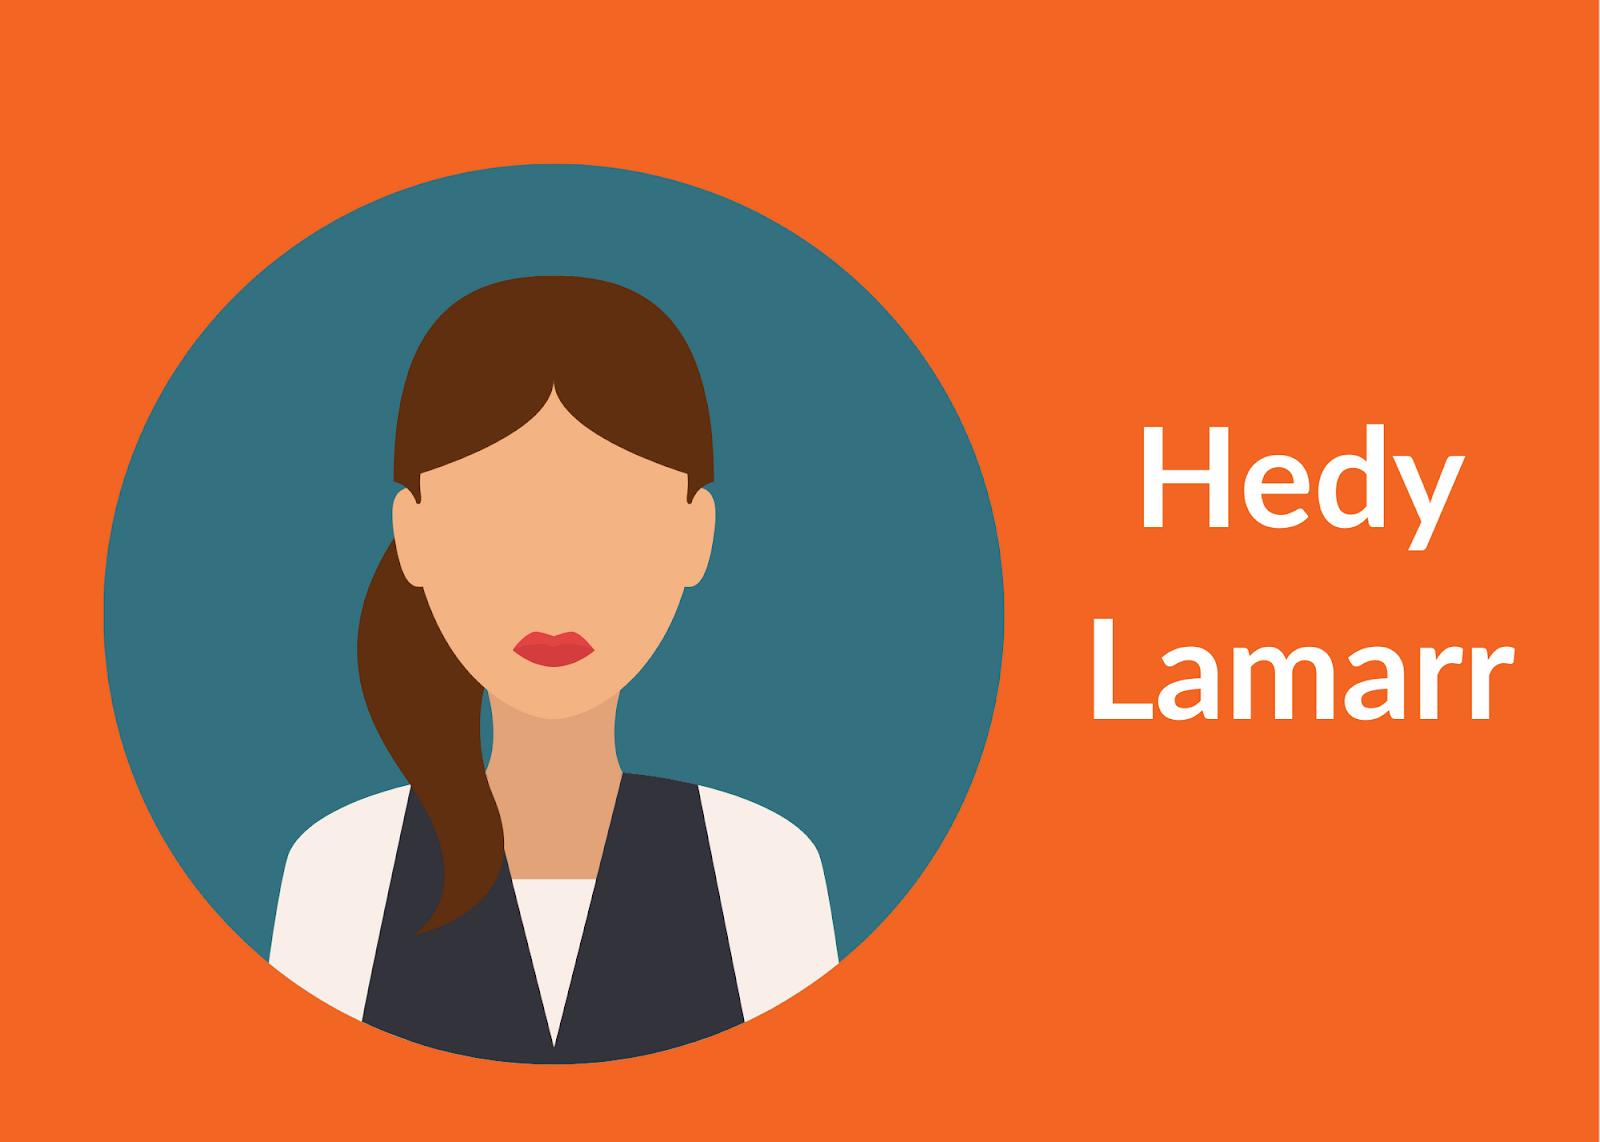 Hedy Lamarr avatar